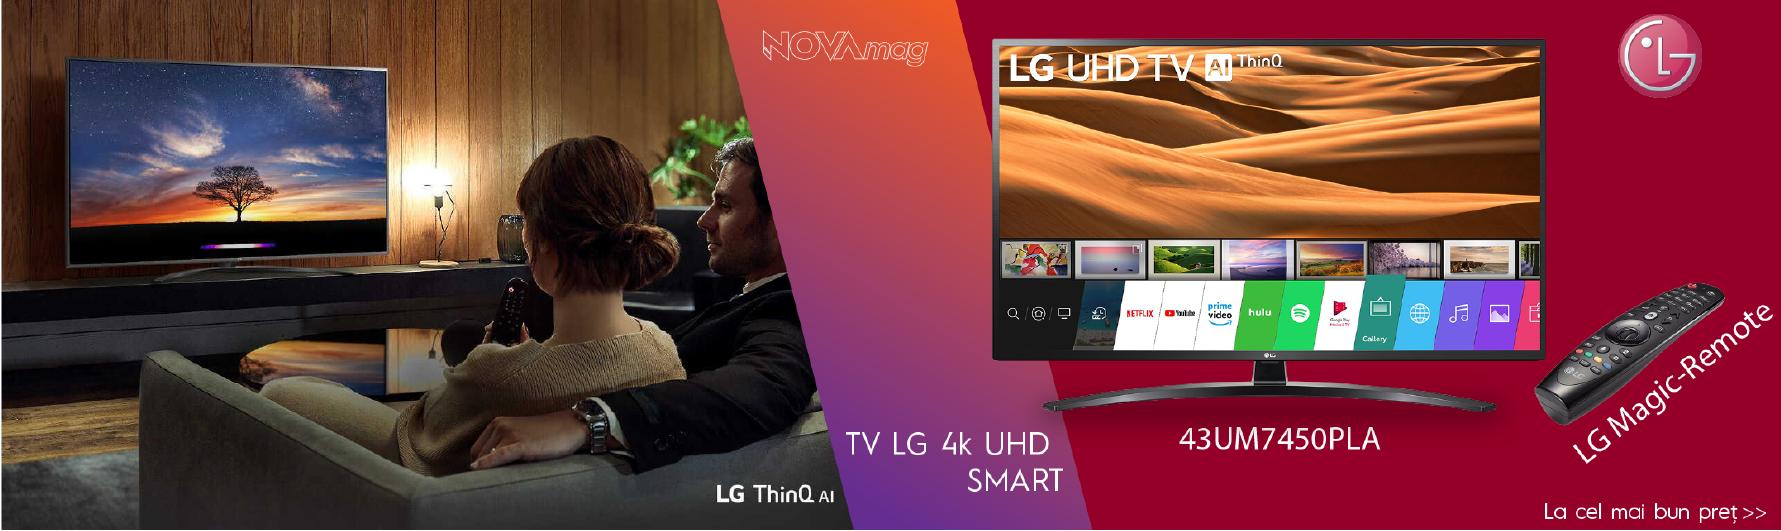 Promo LG TV+ Magic Remote